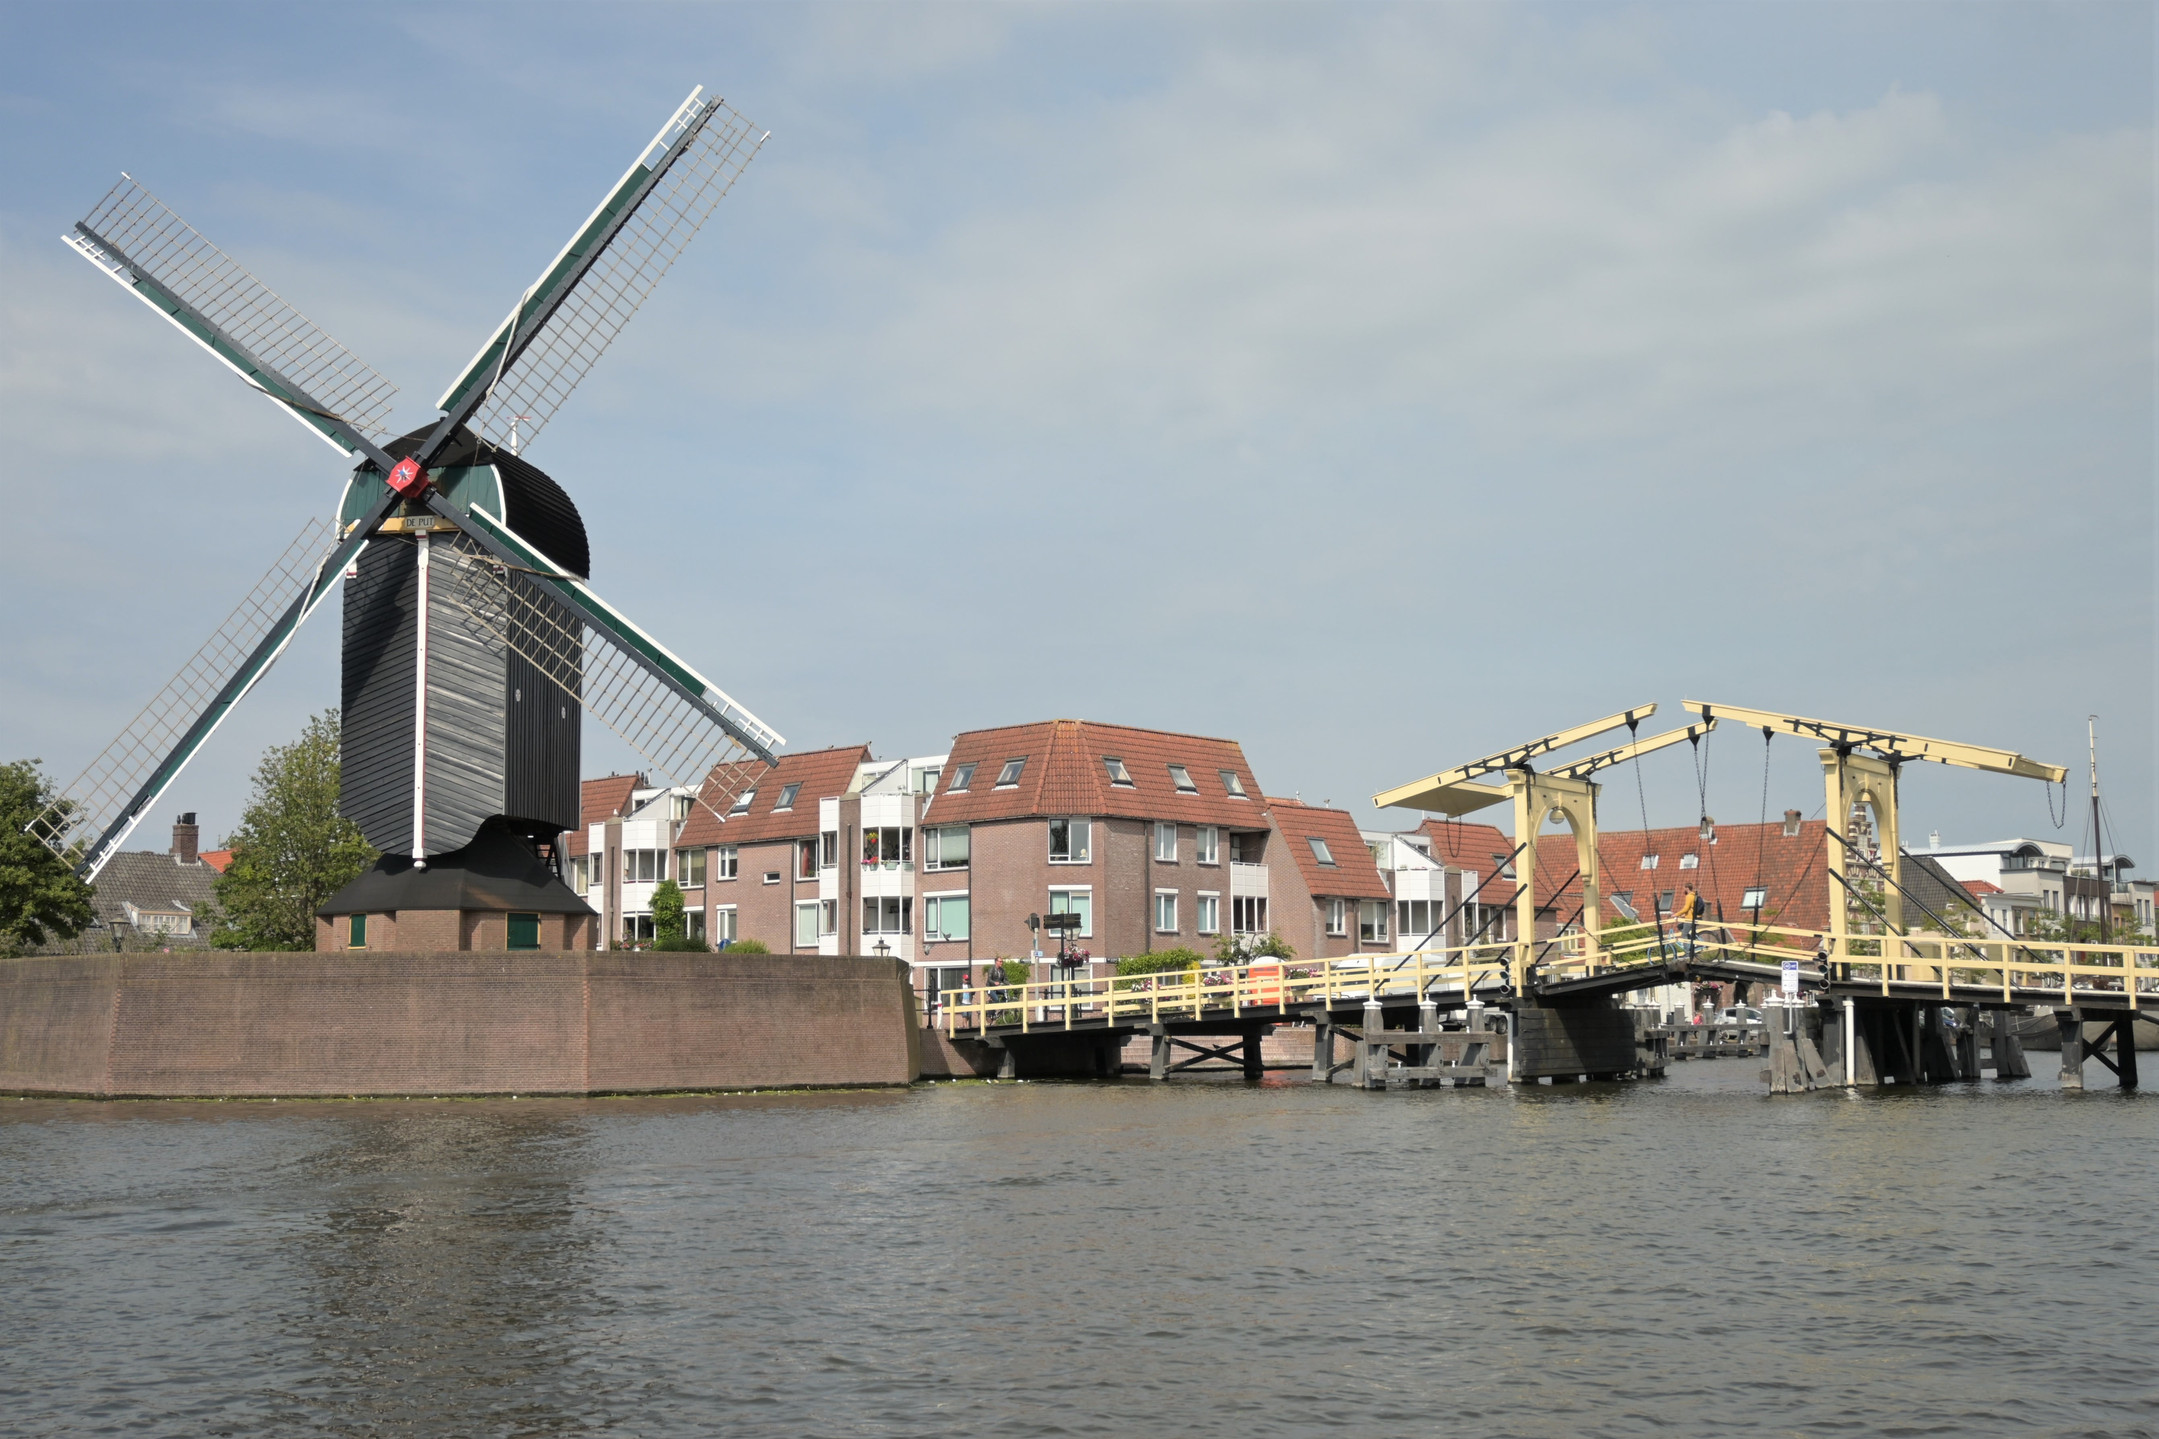 Boattrip Leiden Netherlands city views